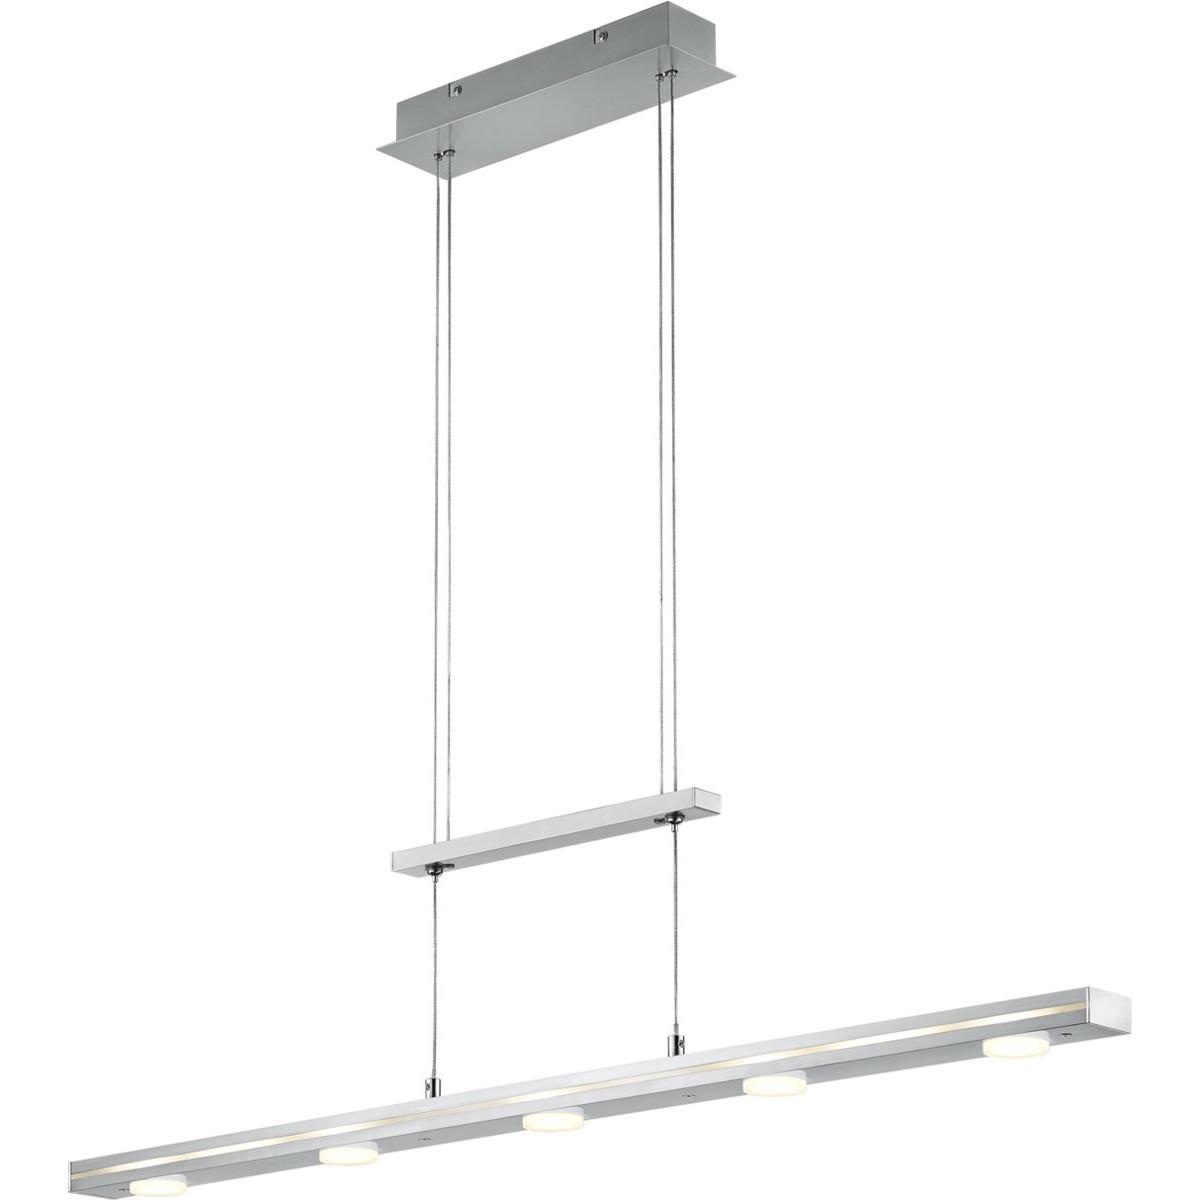 LED Hanglamp - Trion Lacy - 21W - Aanpasbare Kleur - 7-lichts - Dimbaar - Rechthoek - Mat Nikkel - A